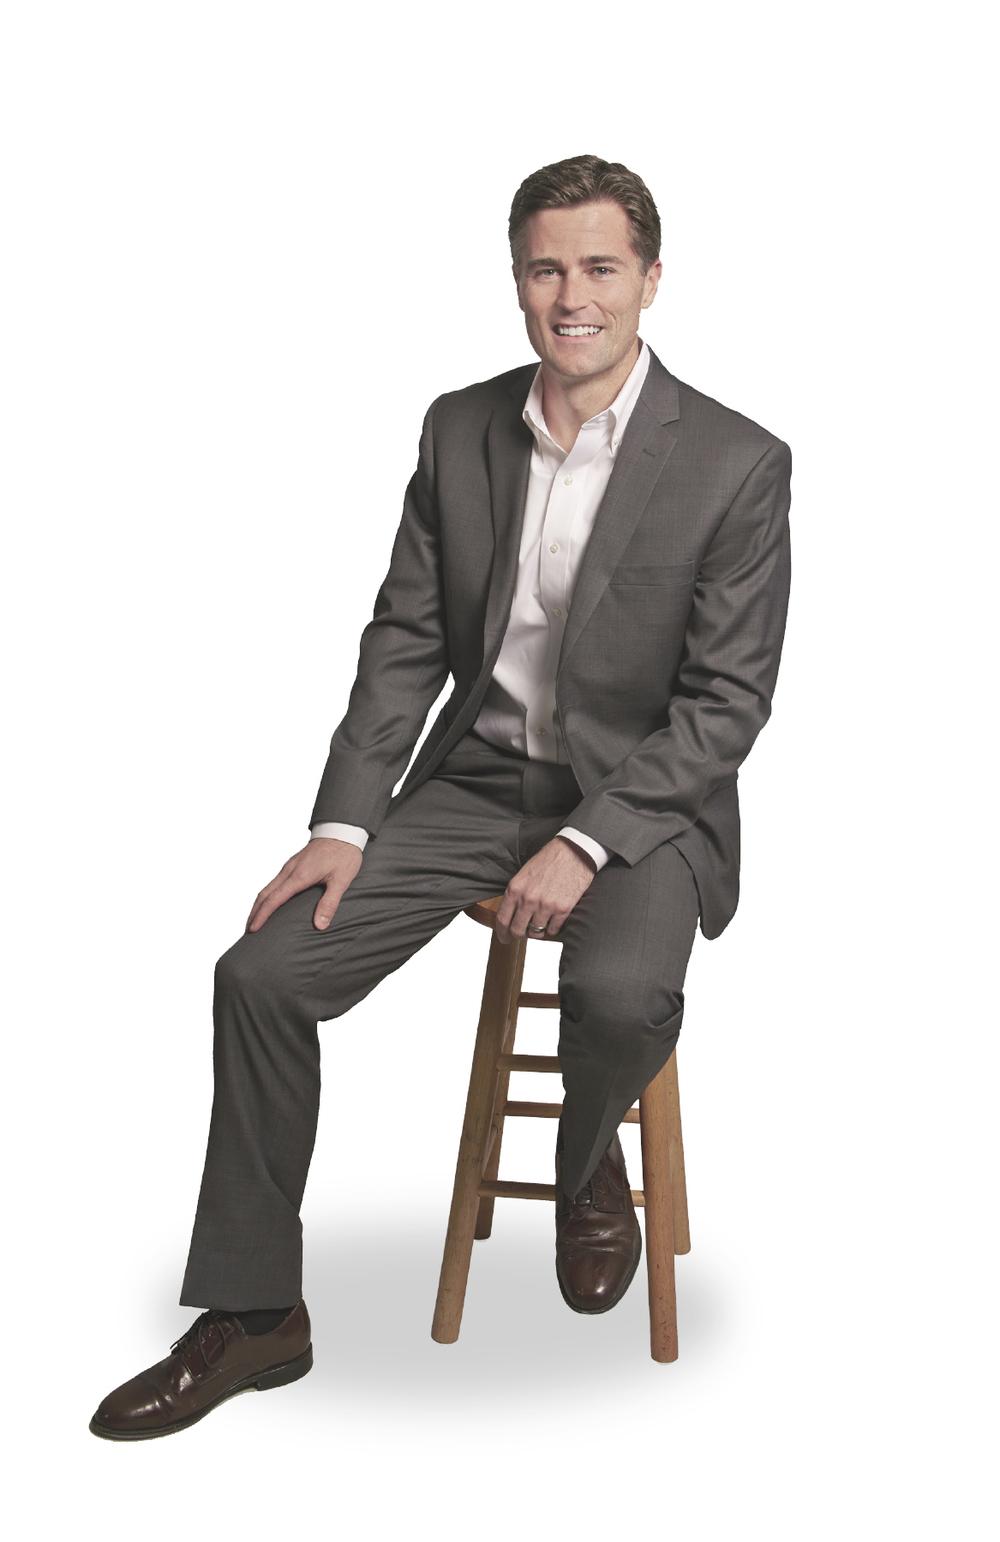 Matt Huelskamp,Executive Vice President